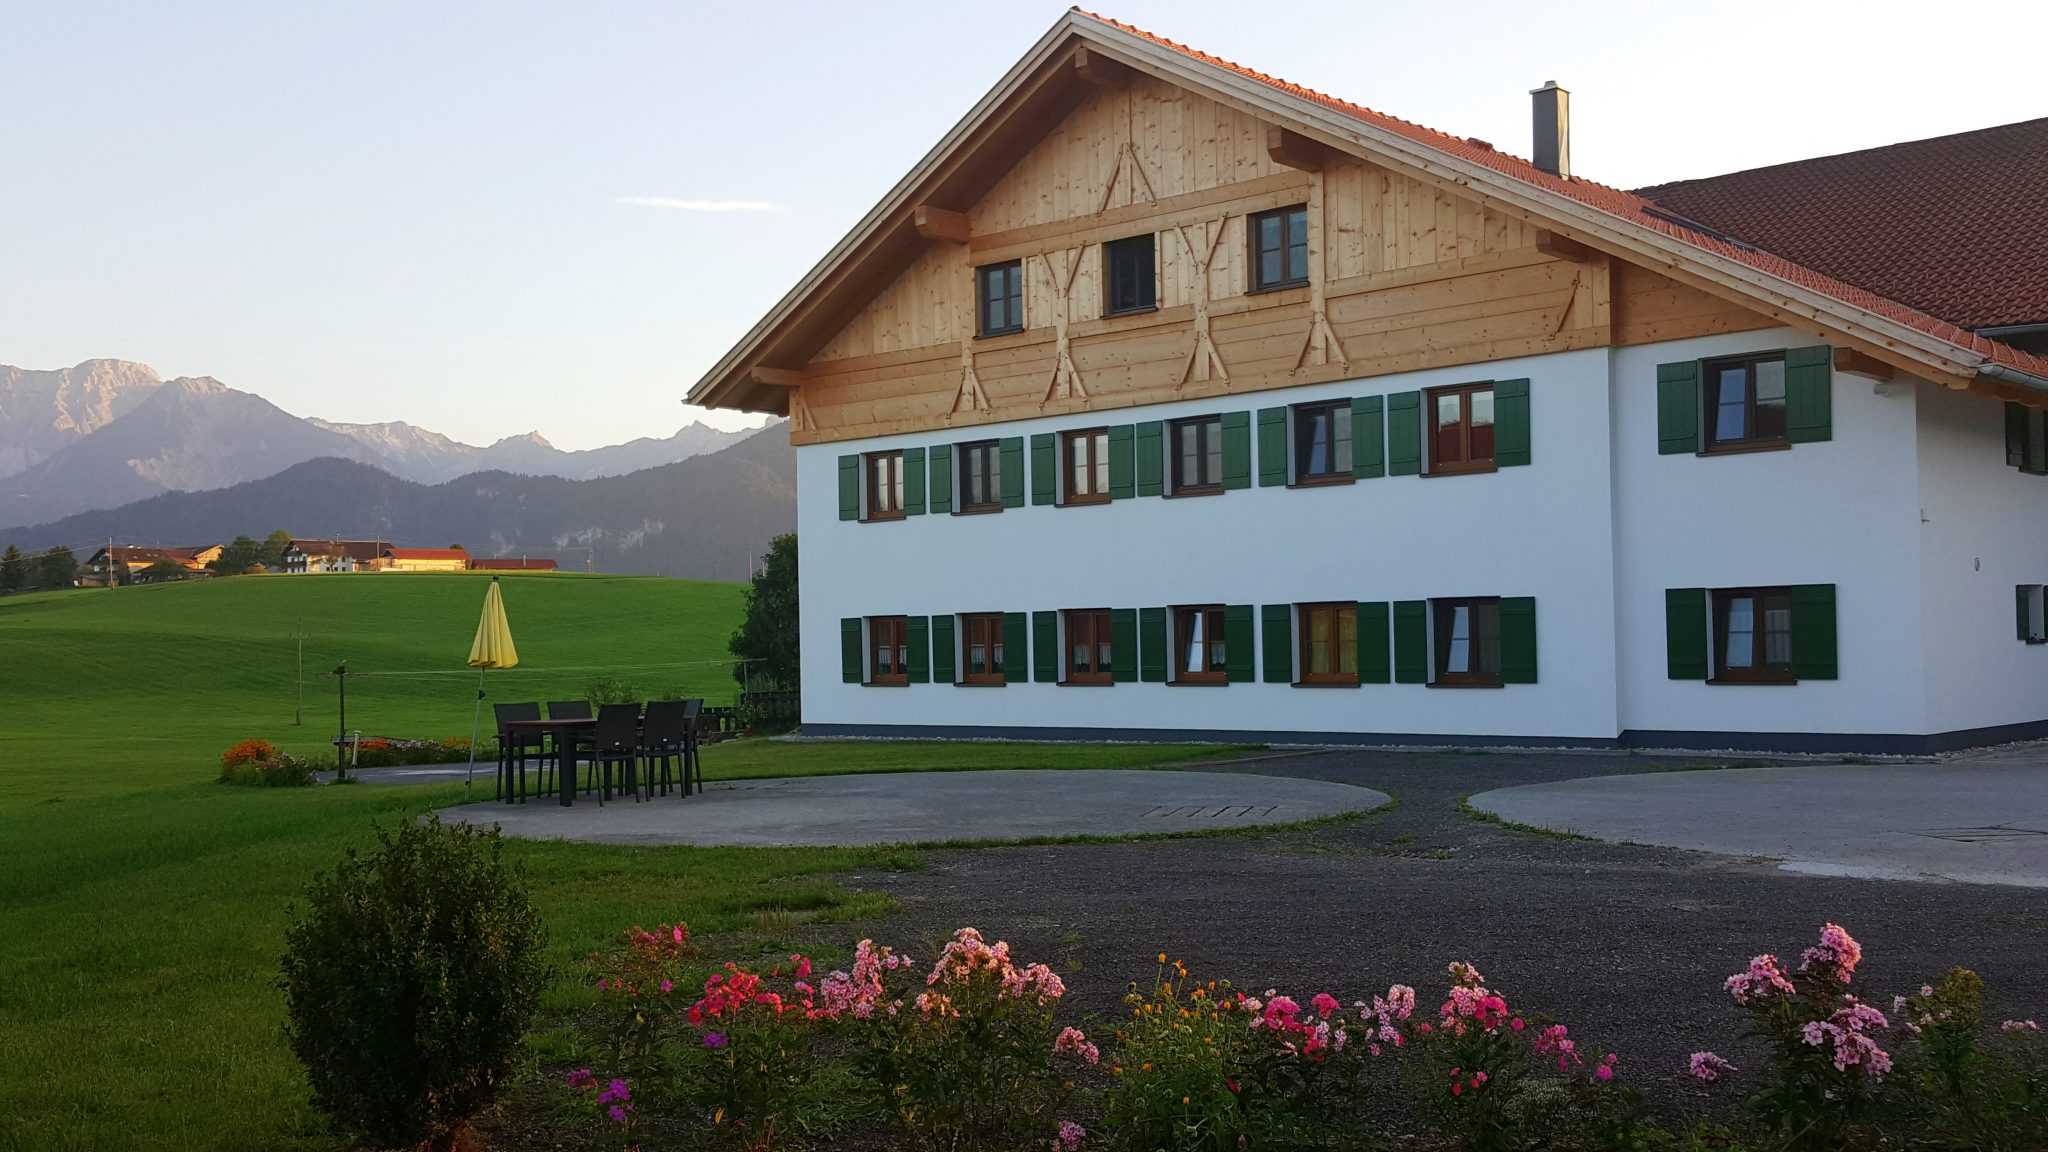 Ferienhof Dischler Hopferau - Allgäu